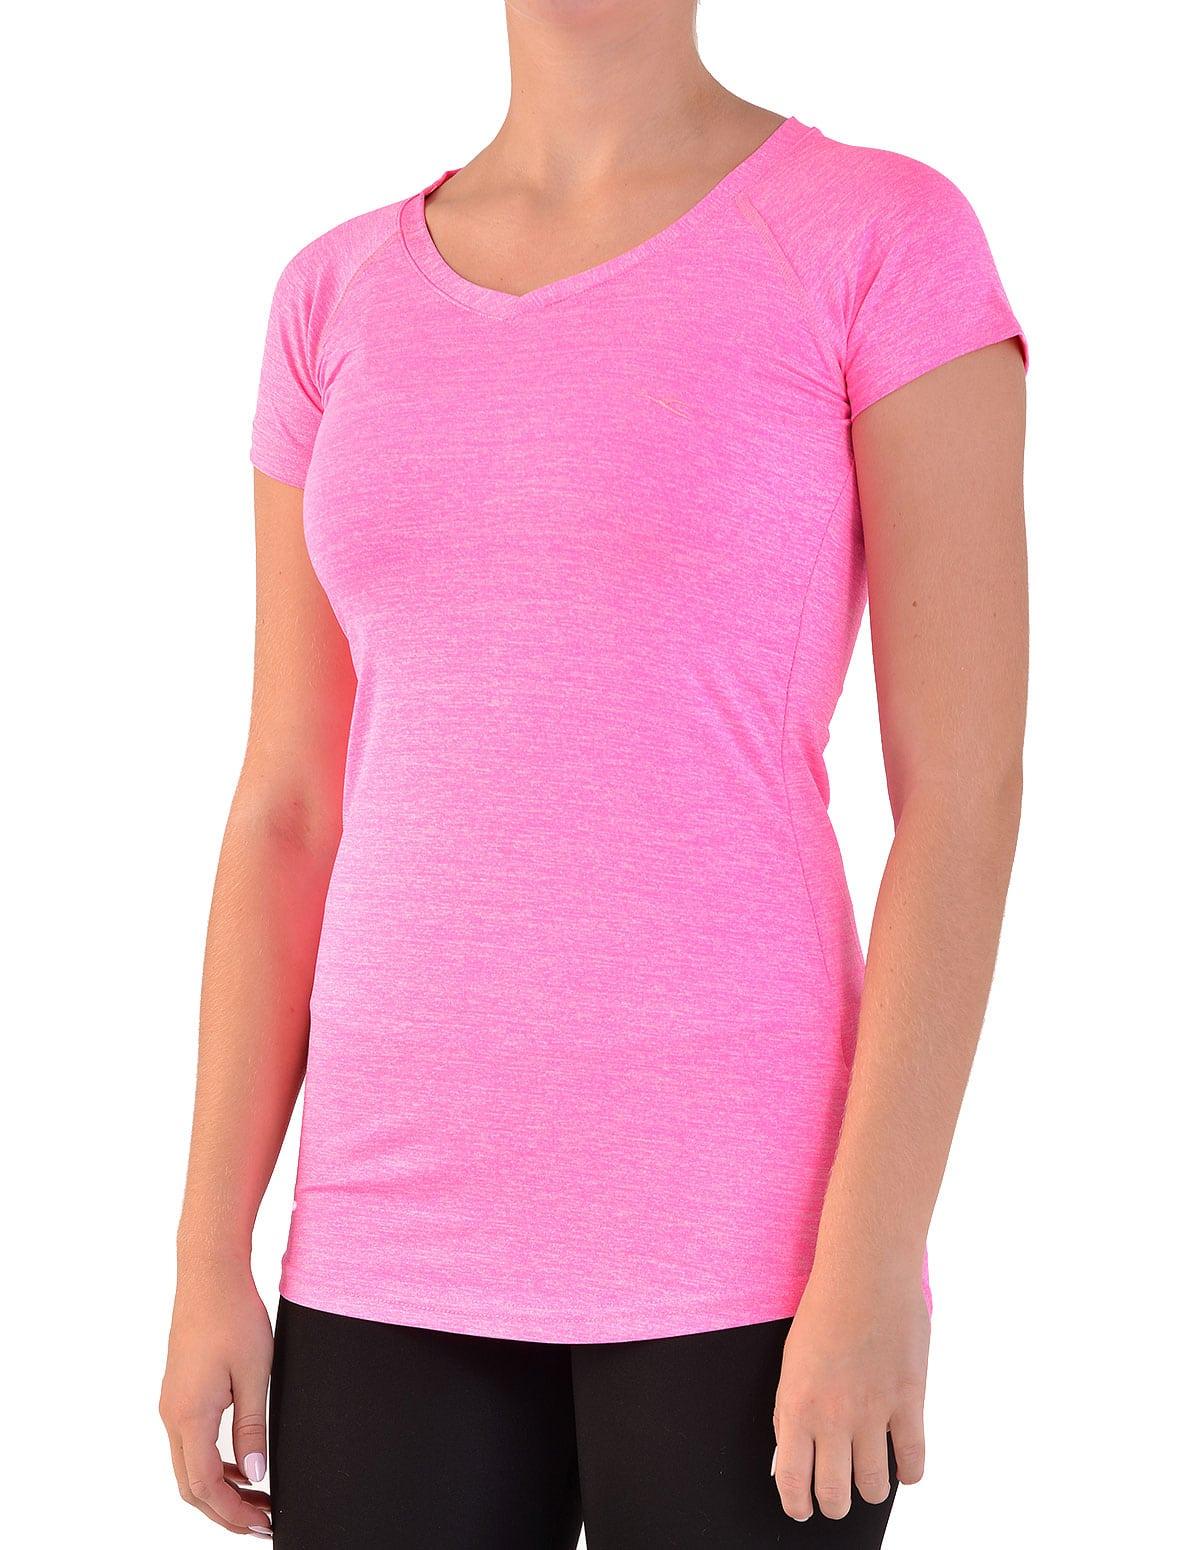 f033fbebc46 Γυναικείο αθλητικό μπλουζάκι gym fit σε φούξια χρώμα